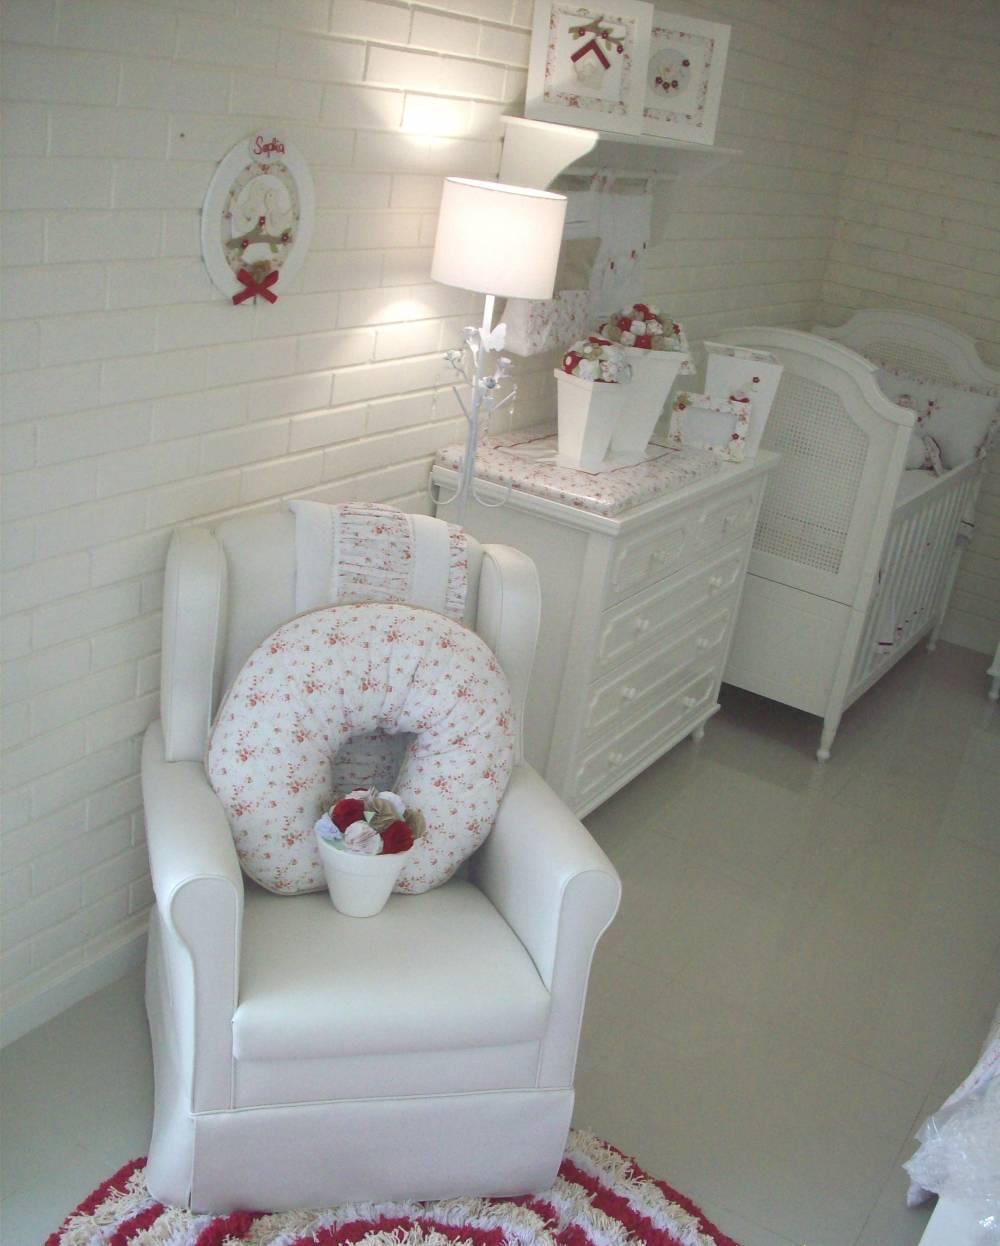 Lojas de Enxoval de Bebê na Aclimação - Loja Enxoval Bebê